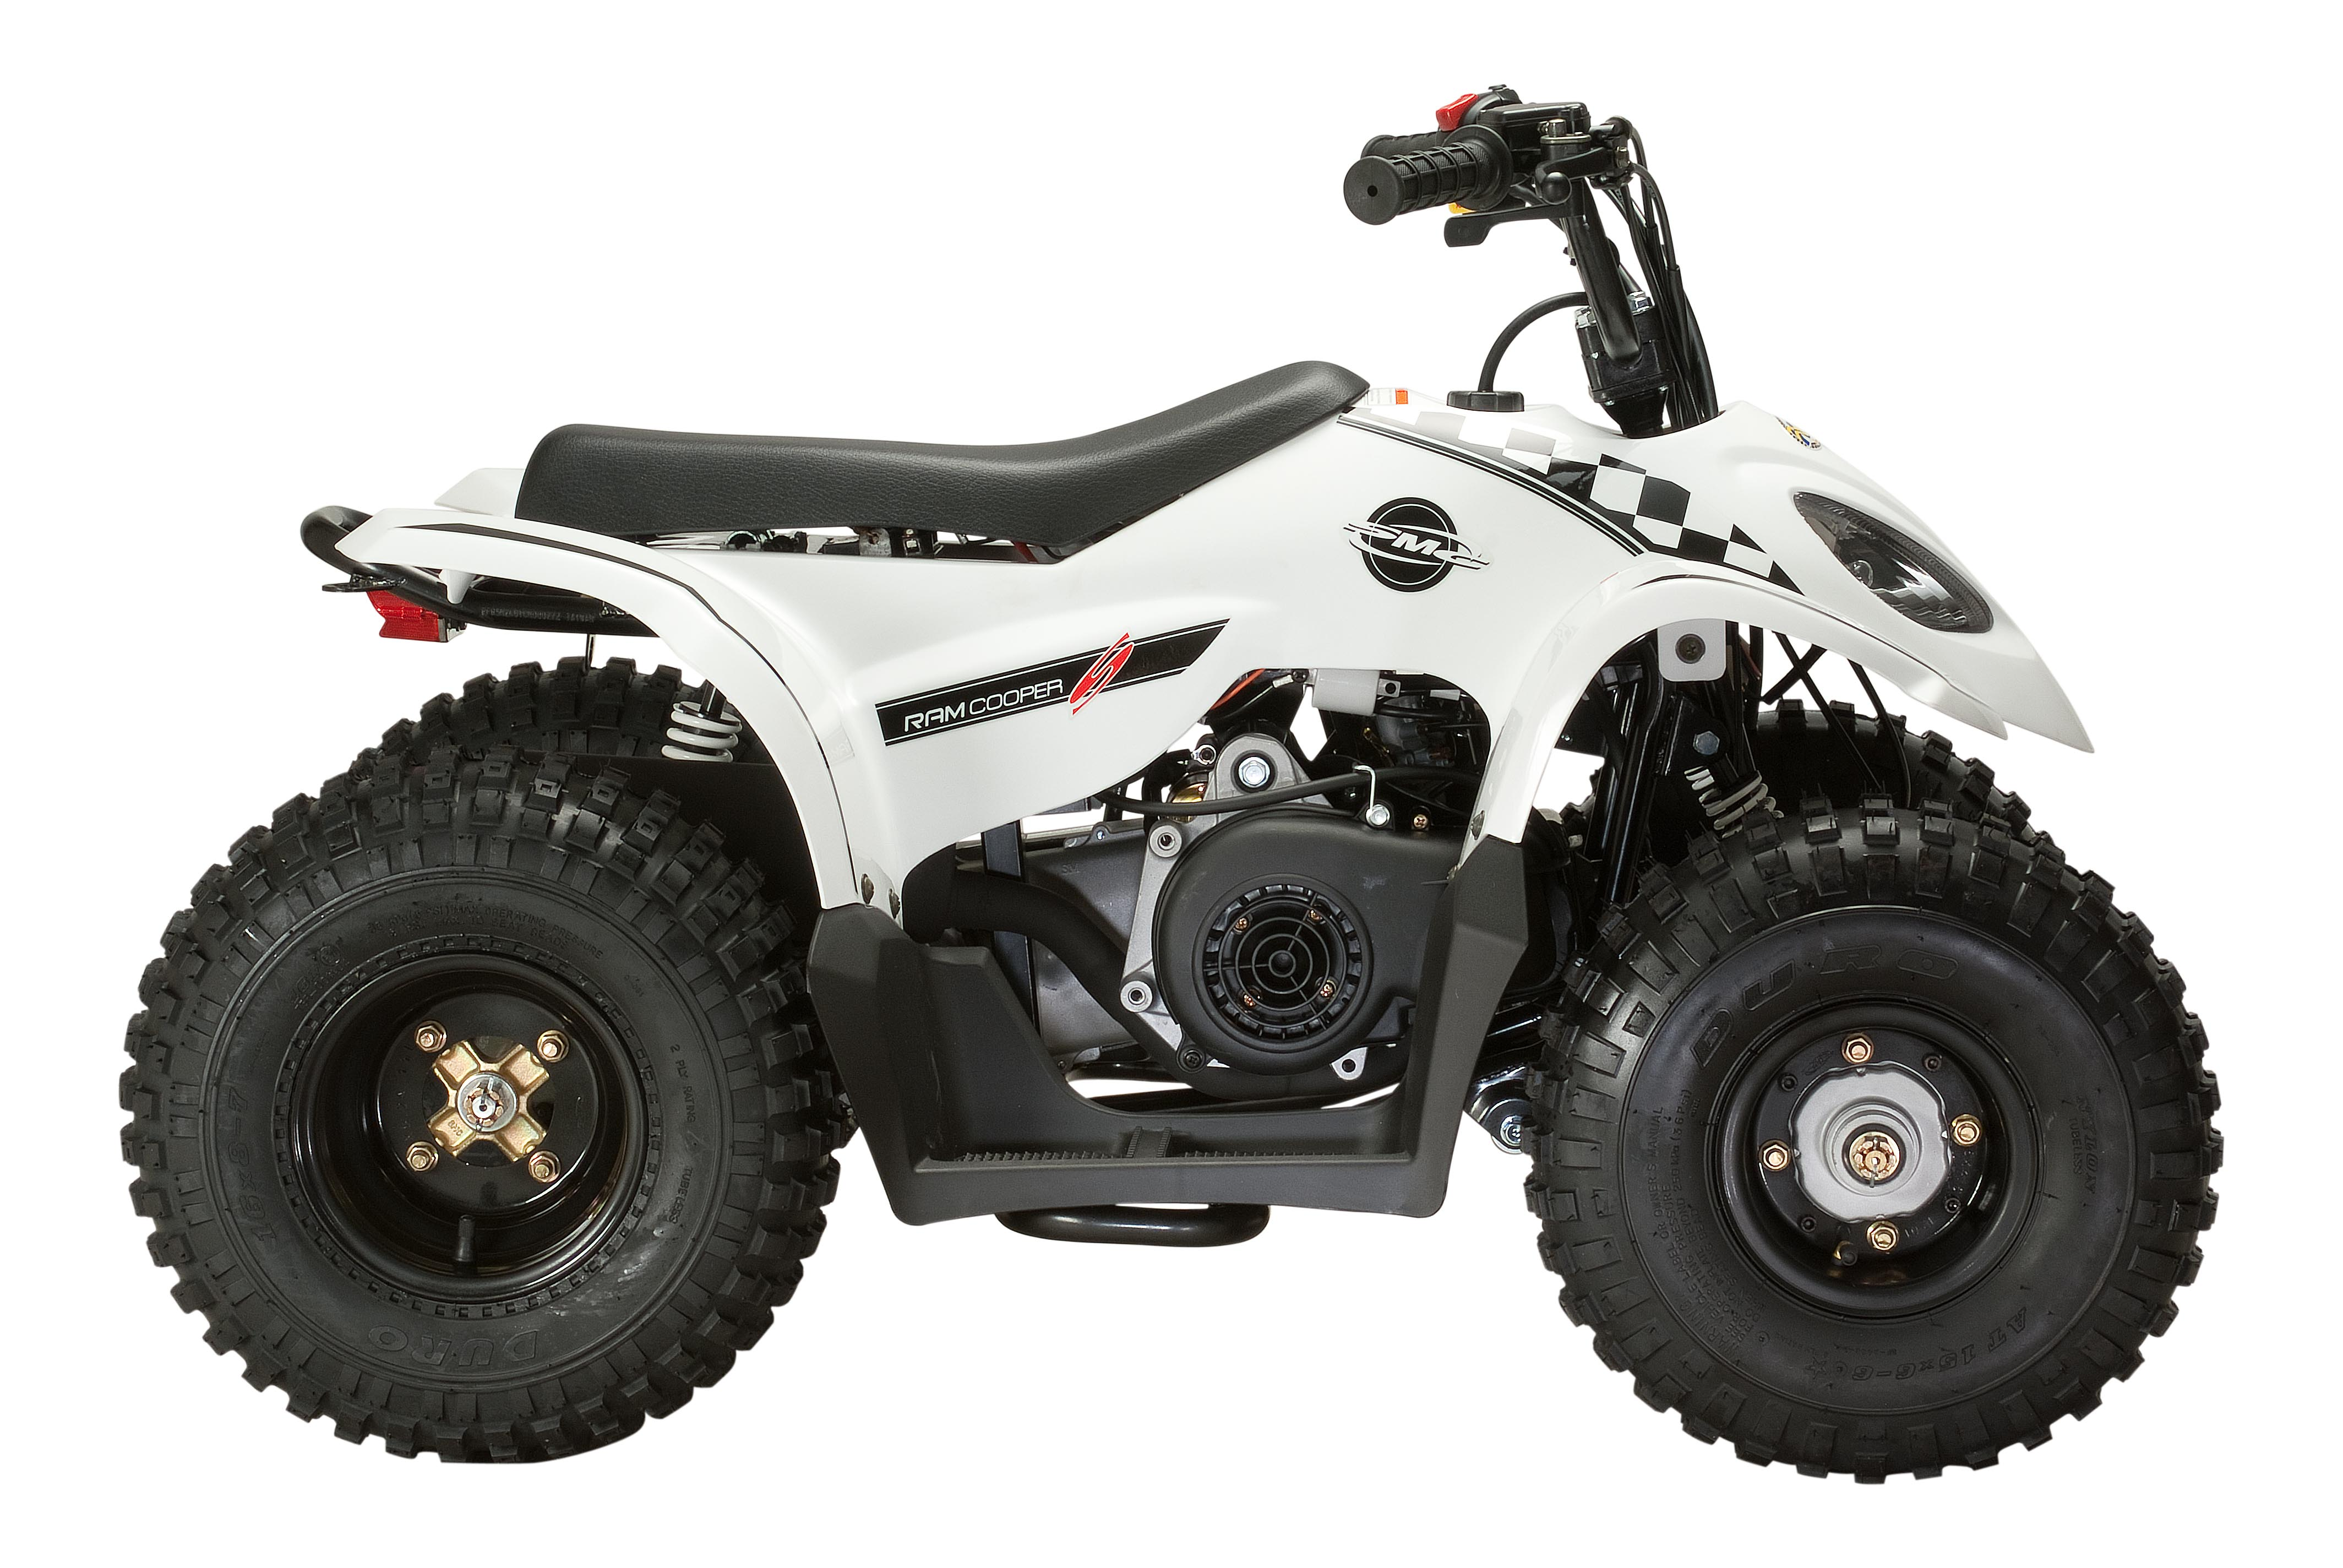 BARN ATV